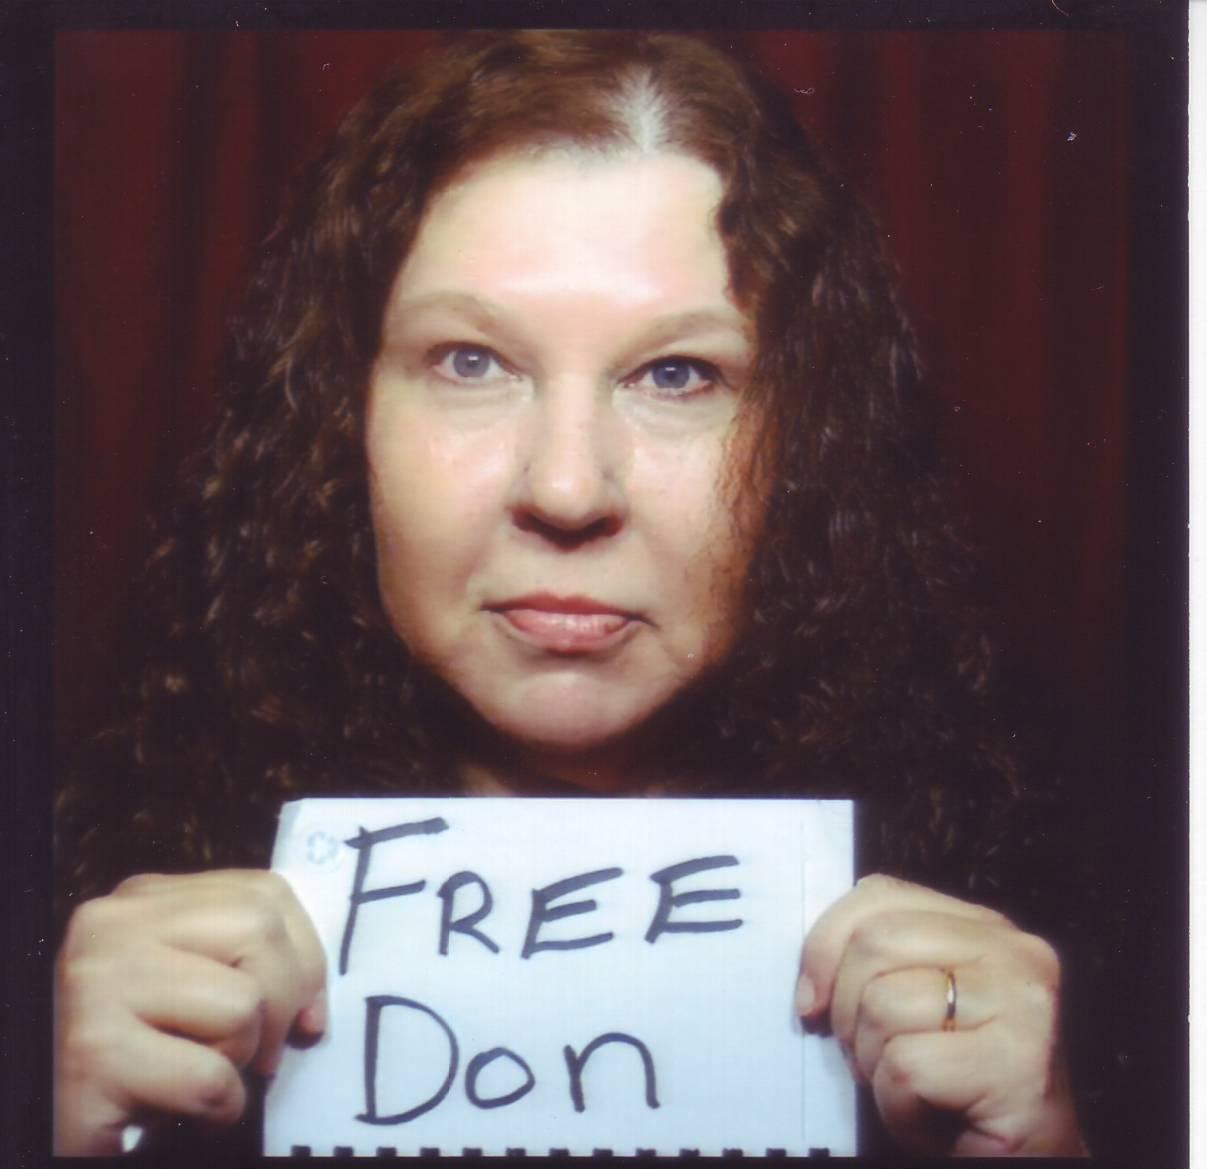 Pam Miles Free Don